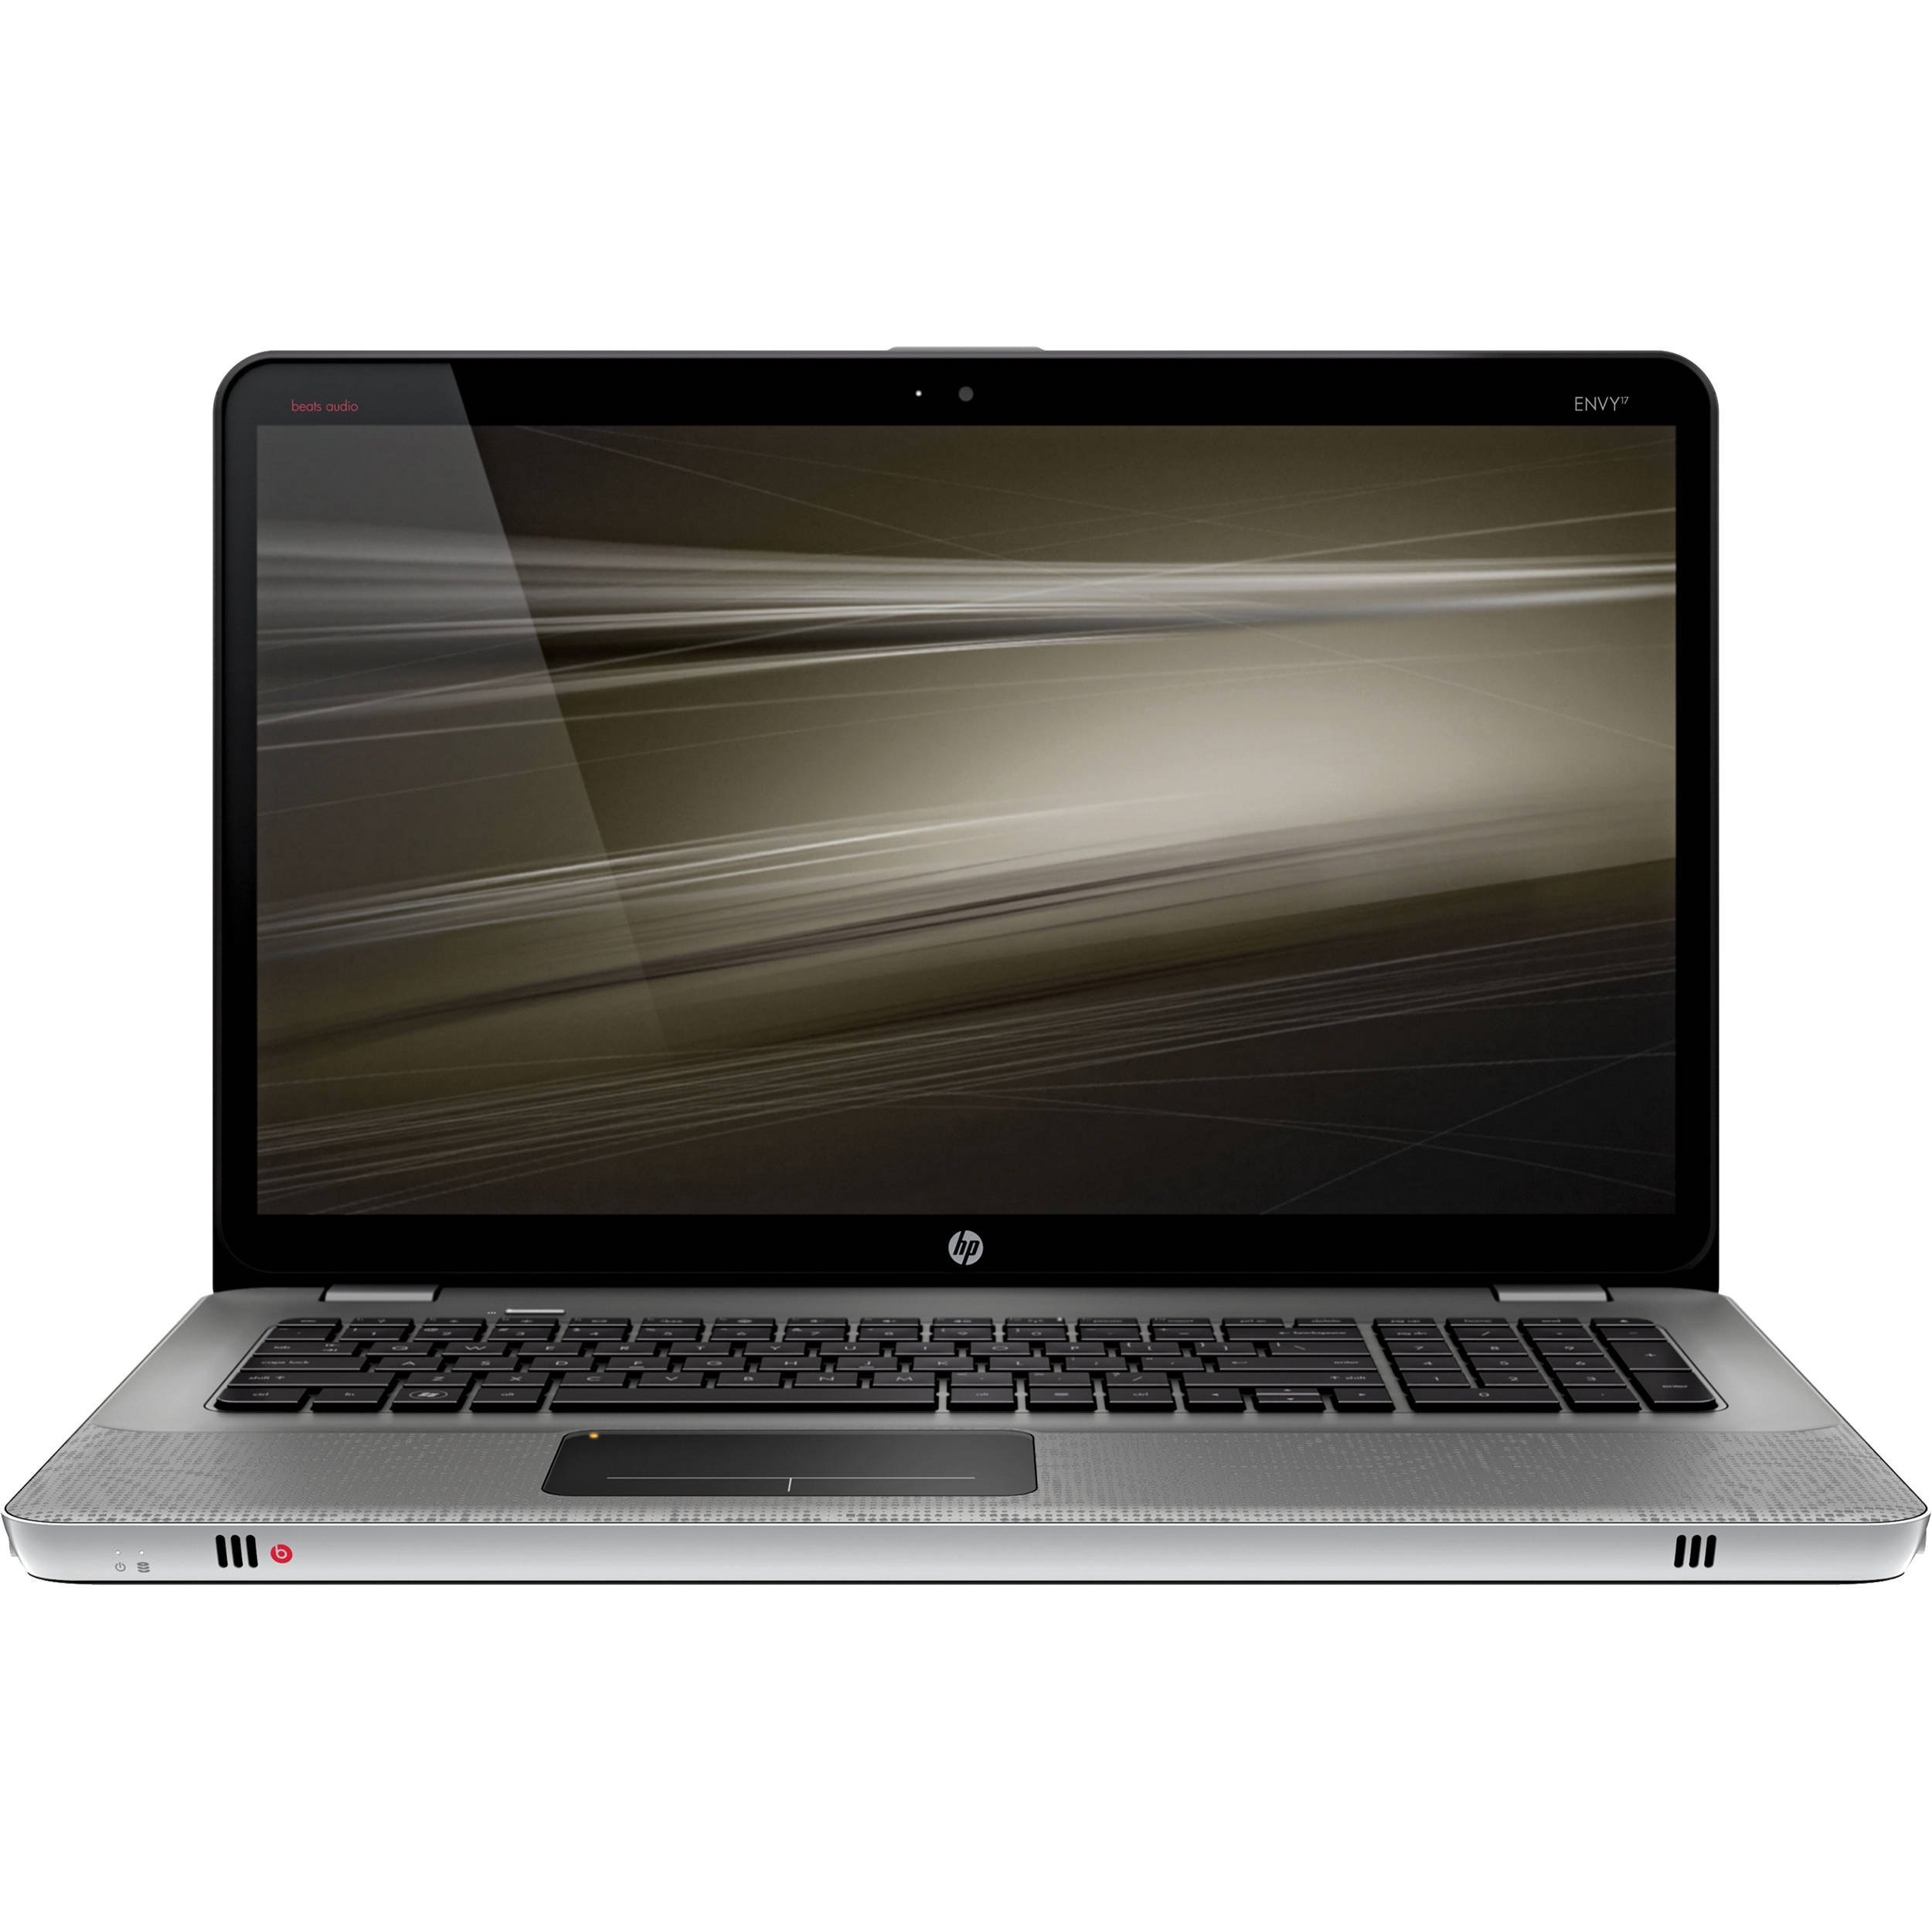 HP Envy 17-1010nr Notebook Drivers Windows